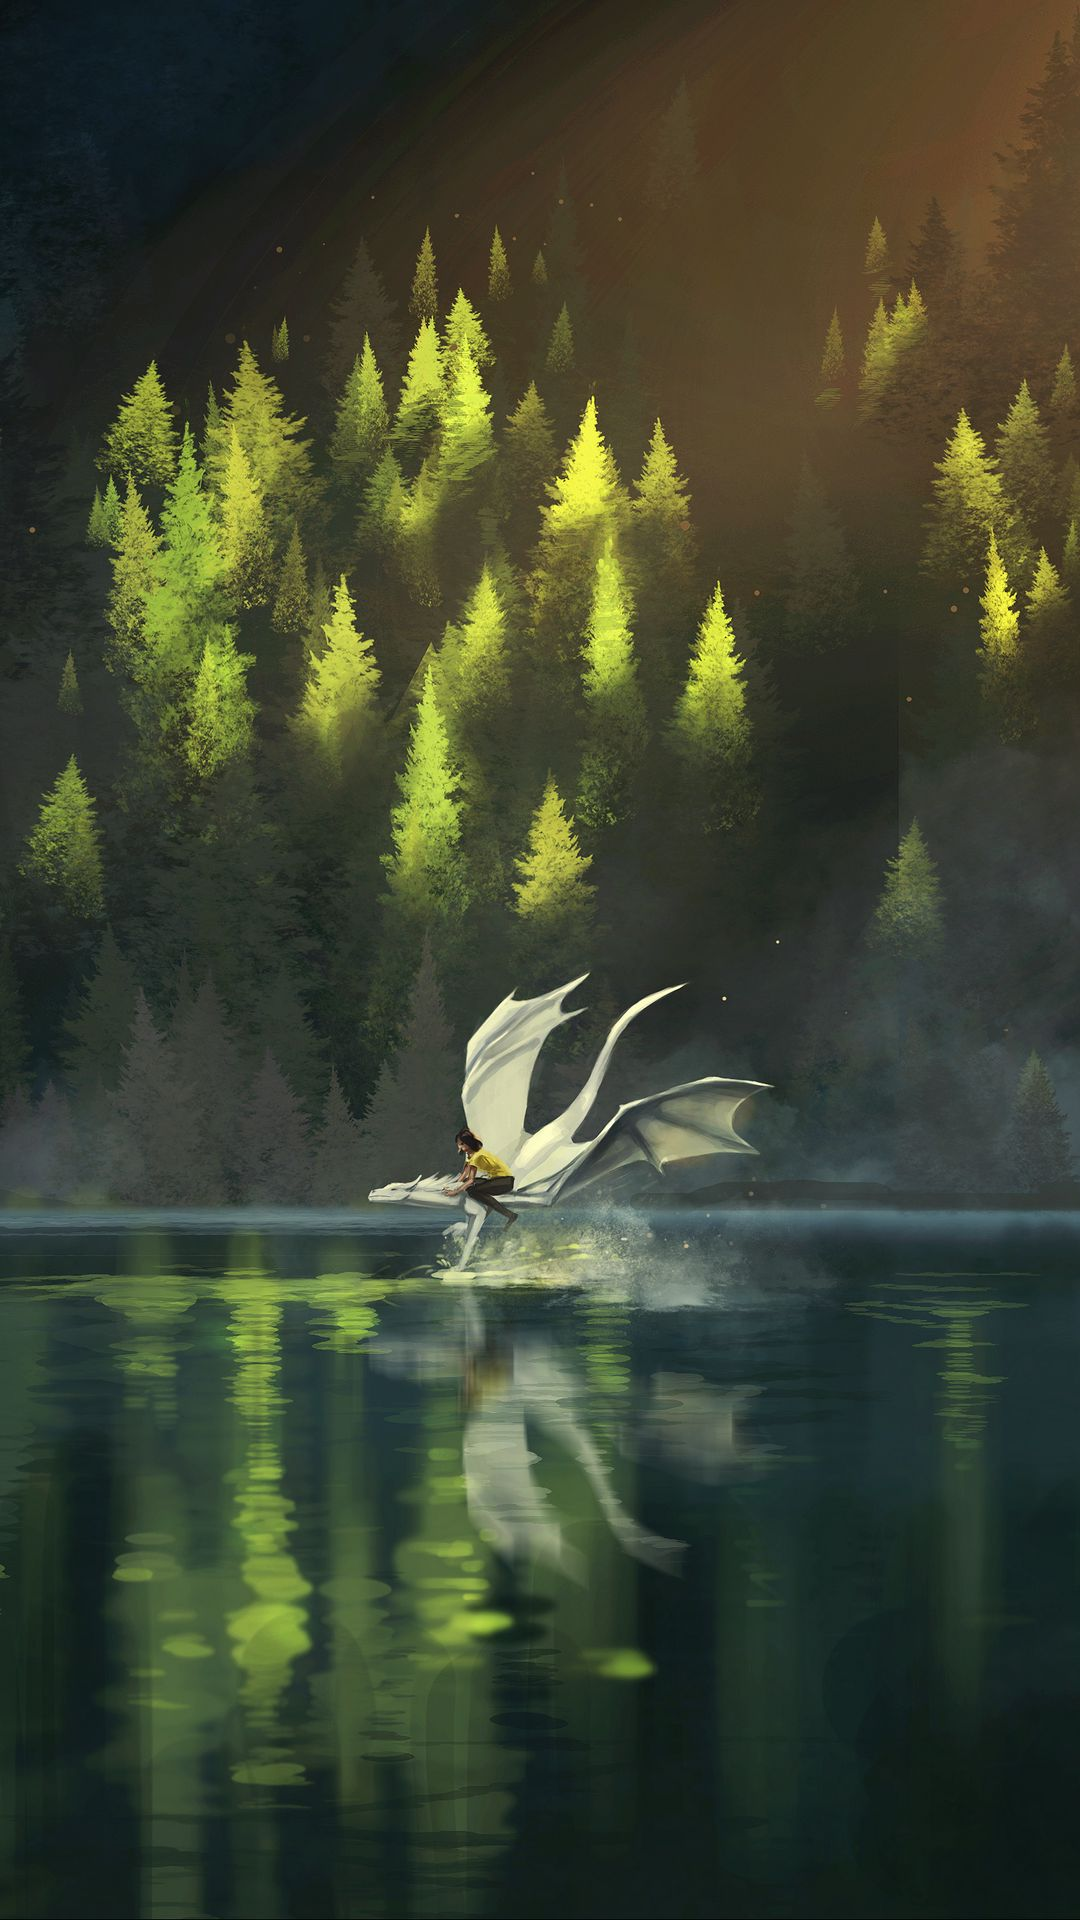 1080x1920 Wallpaper dragon, friends, fantasy, art